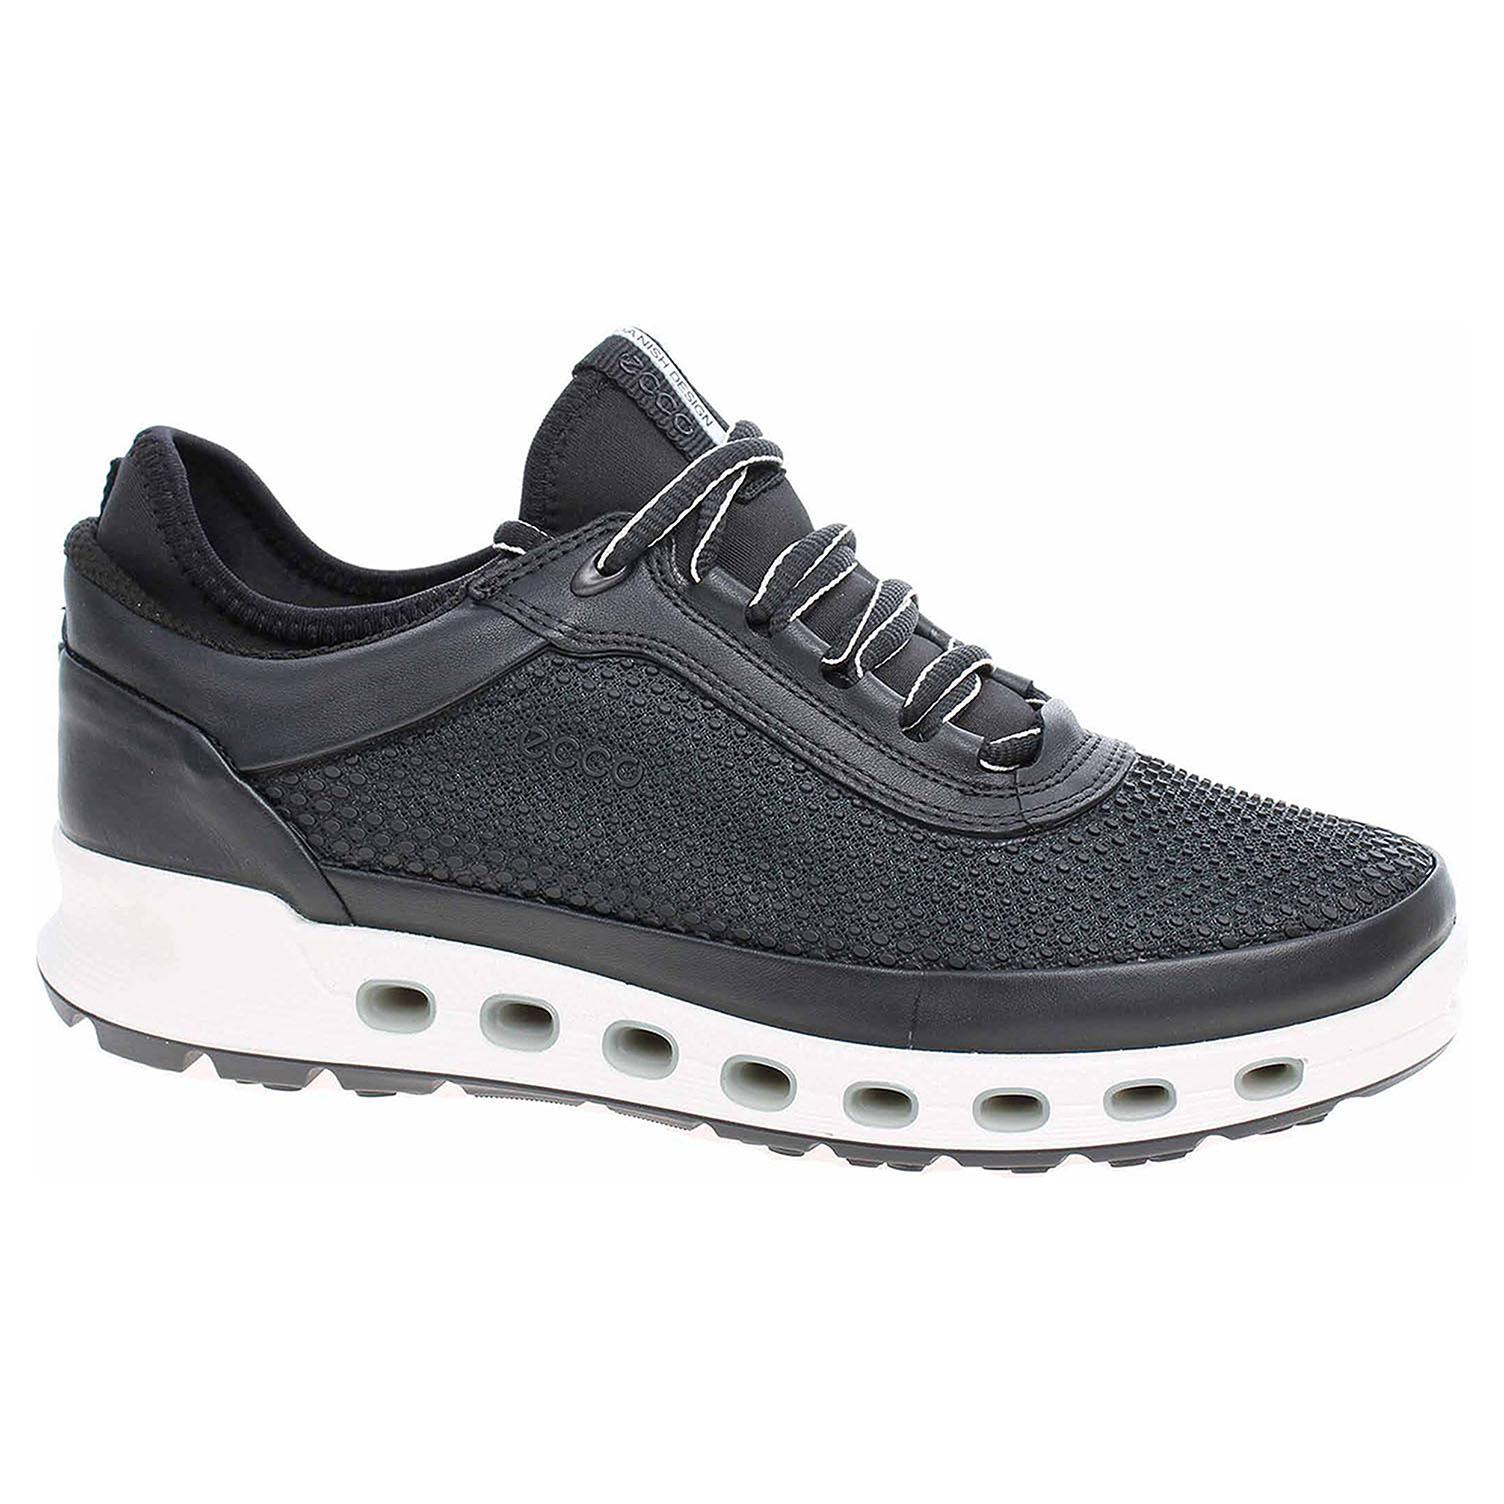 Dámská obuv Ecco Cool 2.0 84250351052 black-black 84250351052 black/black 39